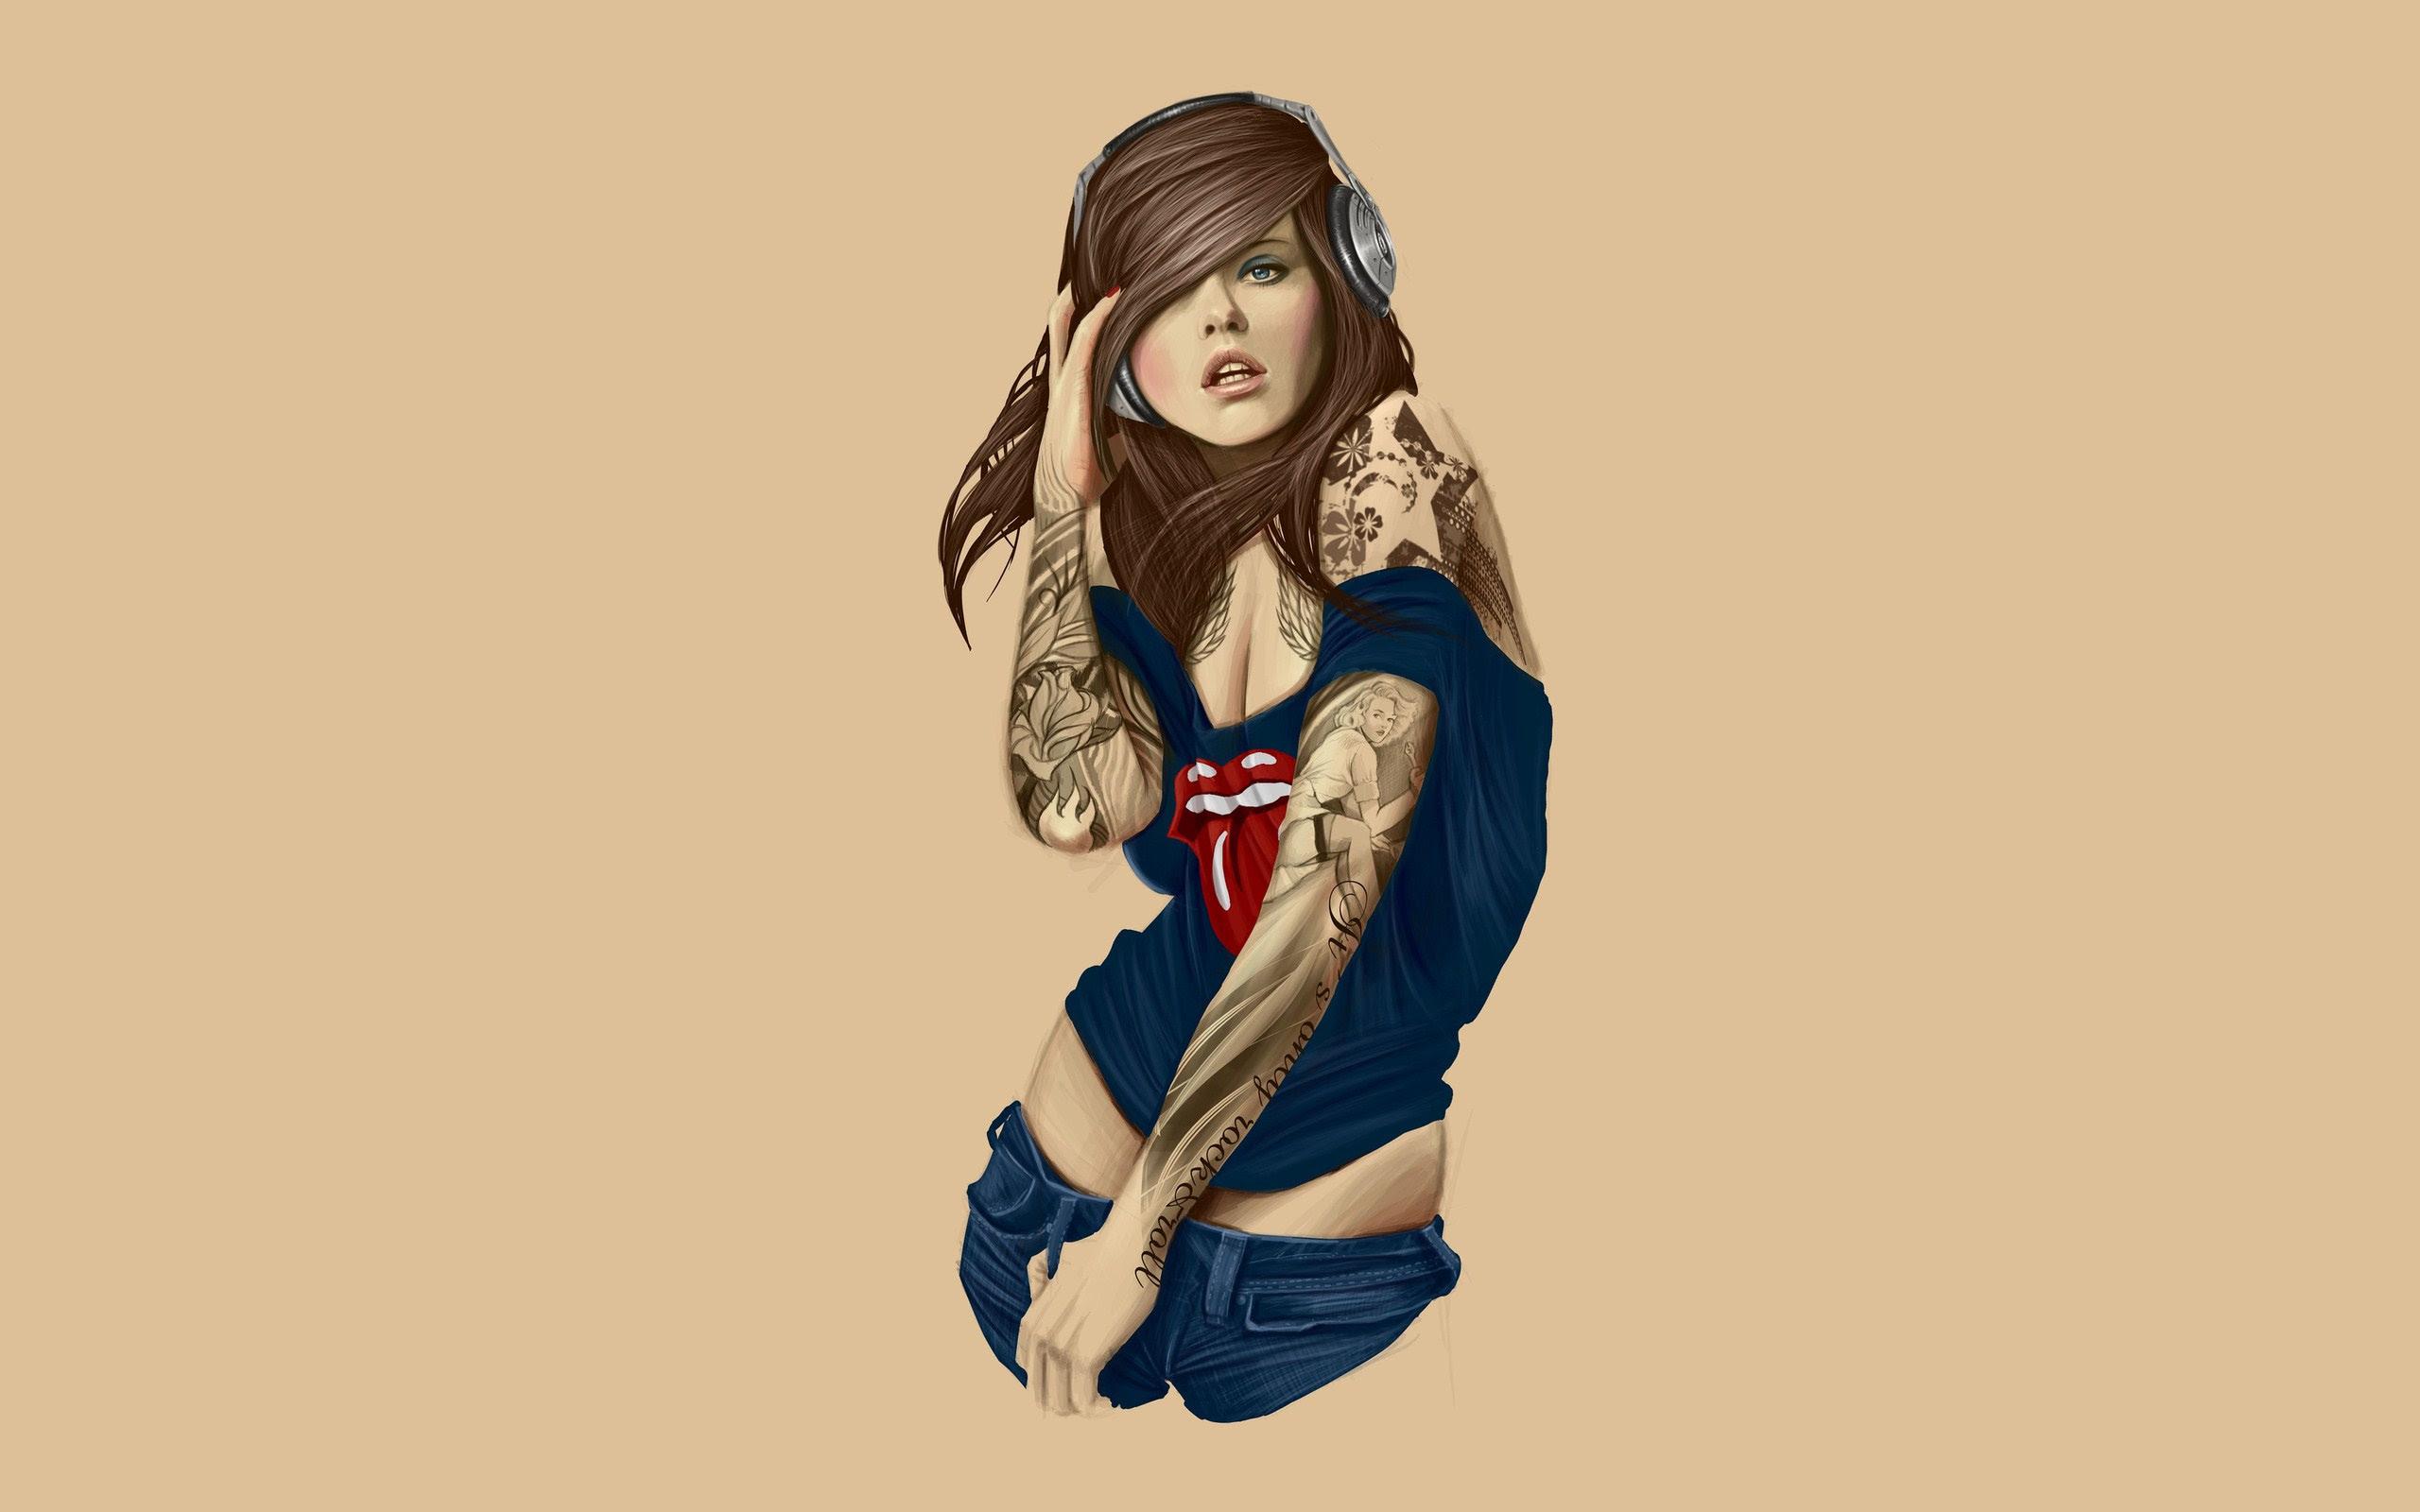 Girl Tattoo Wallpaper Sf Wallpaper